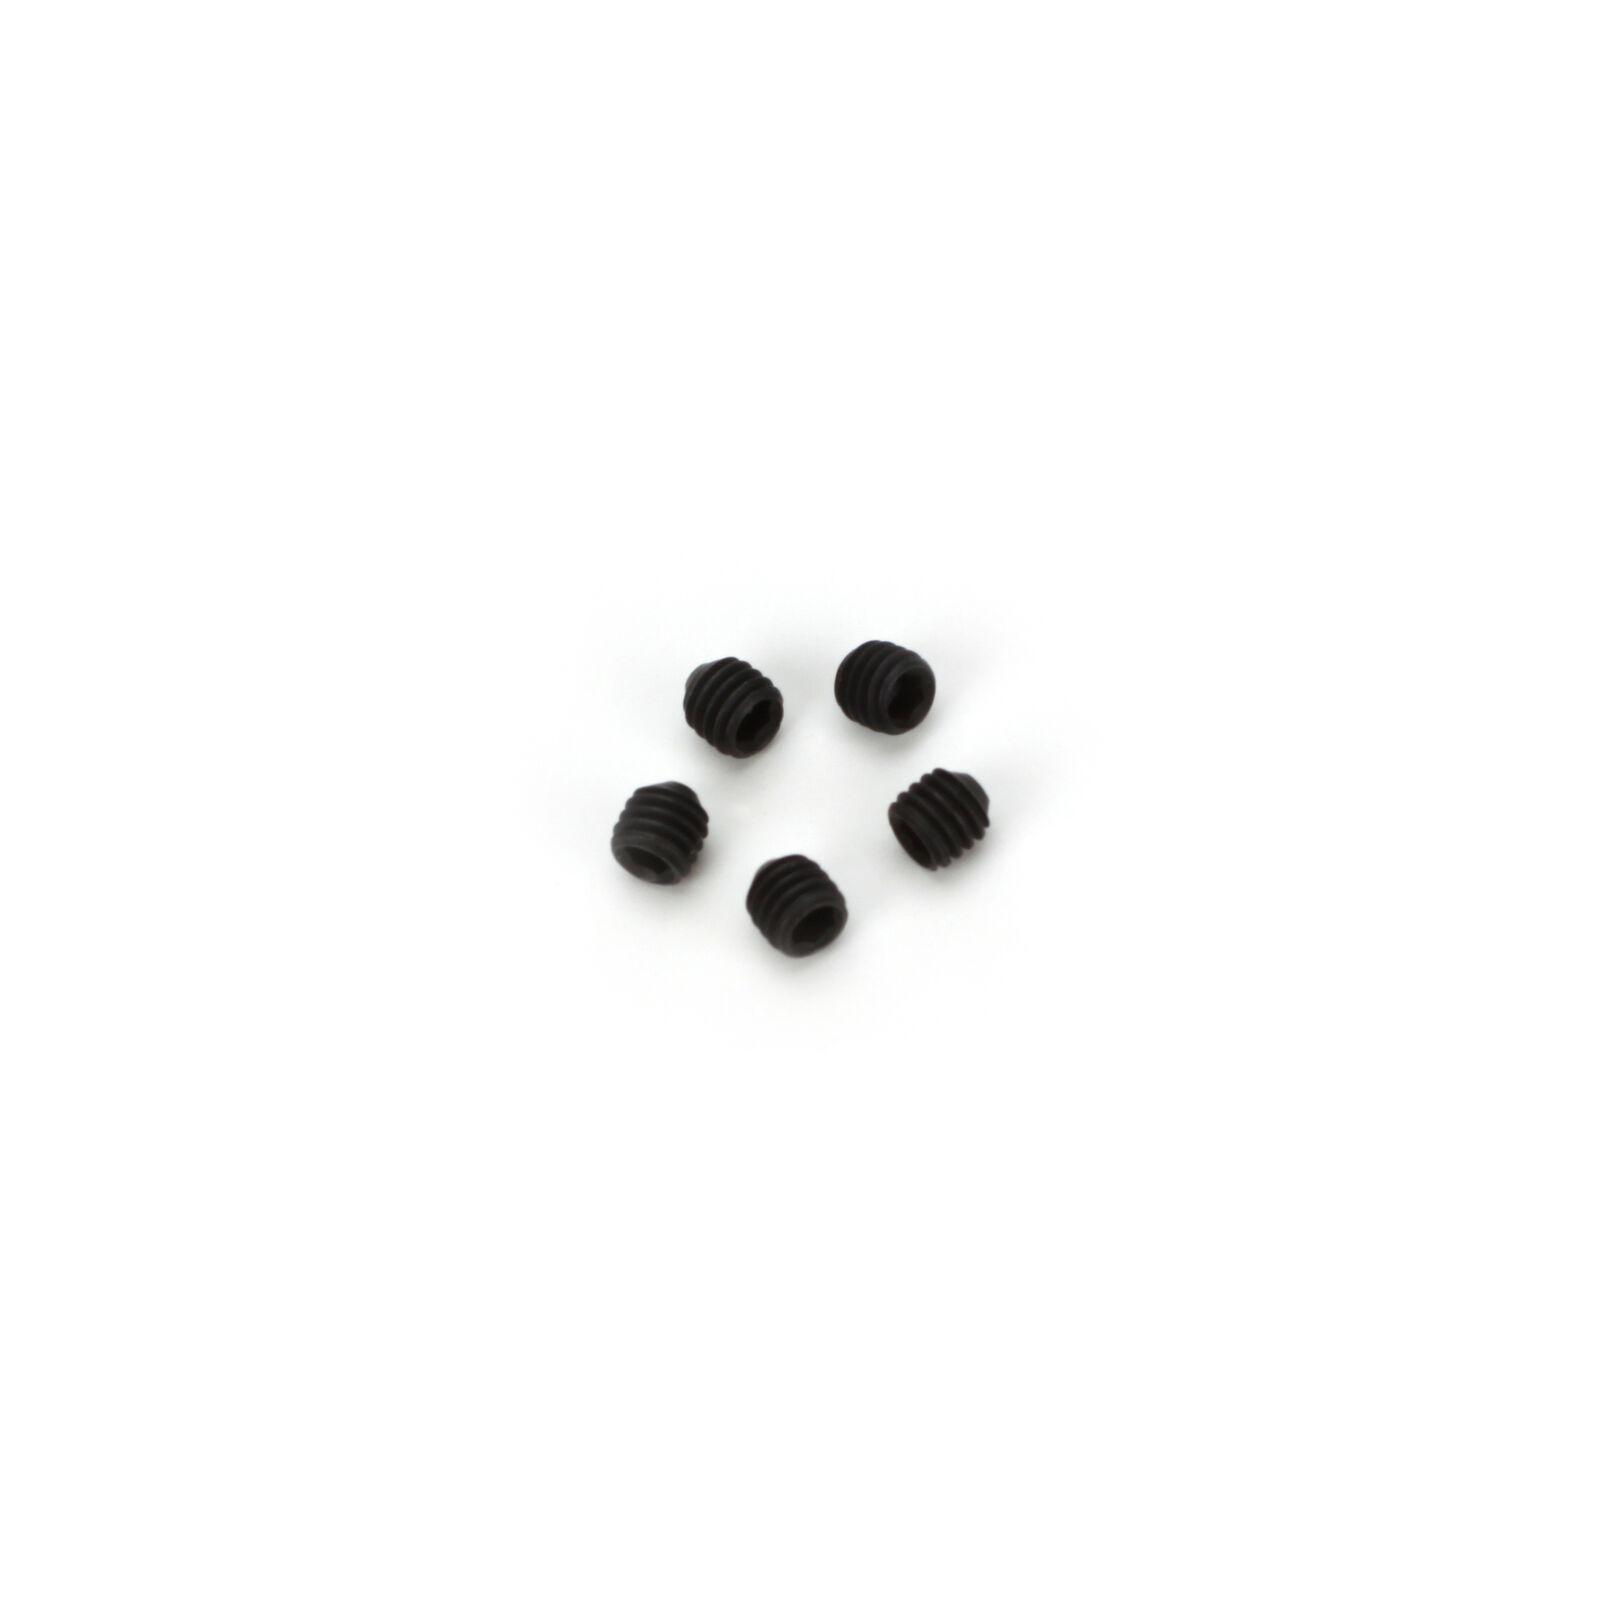 3mm Set Screws (5)